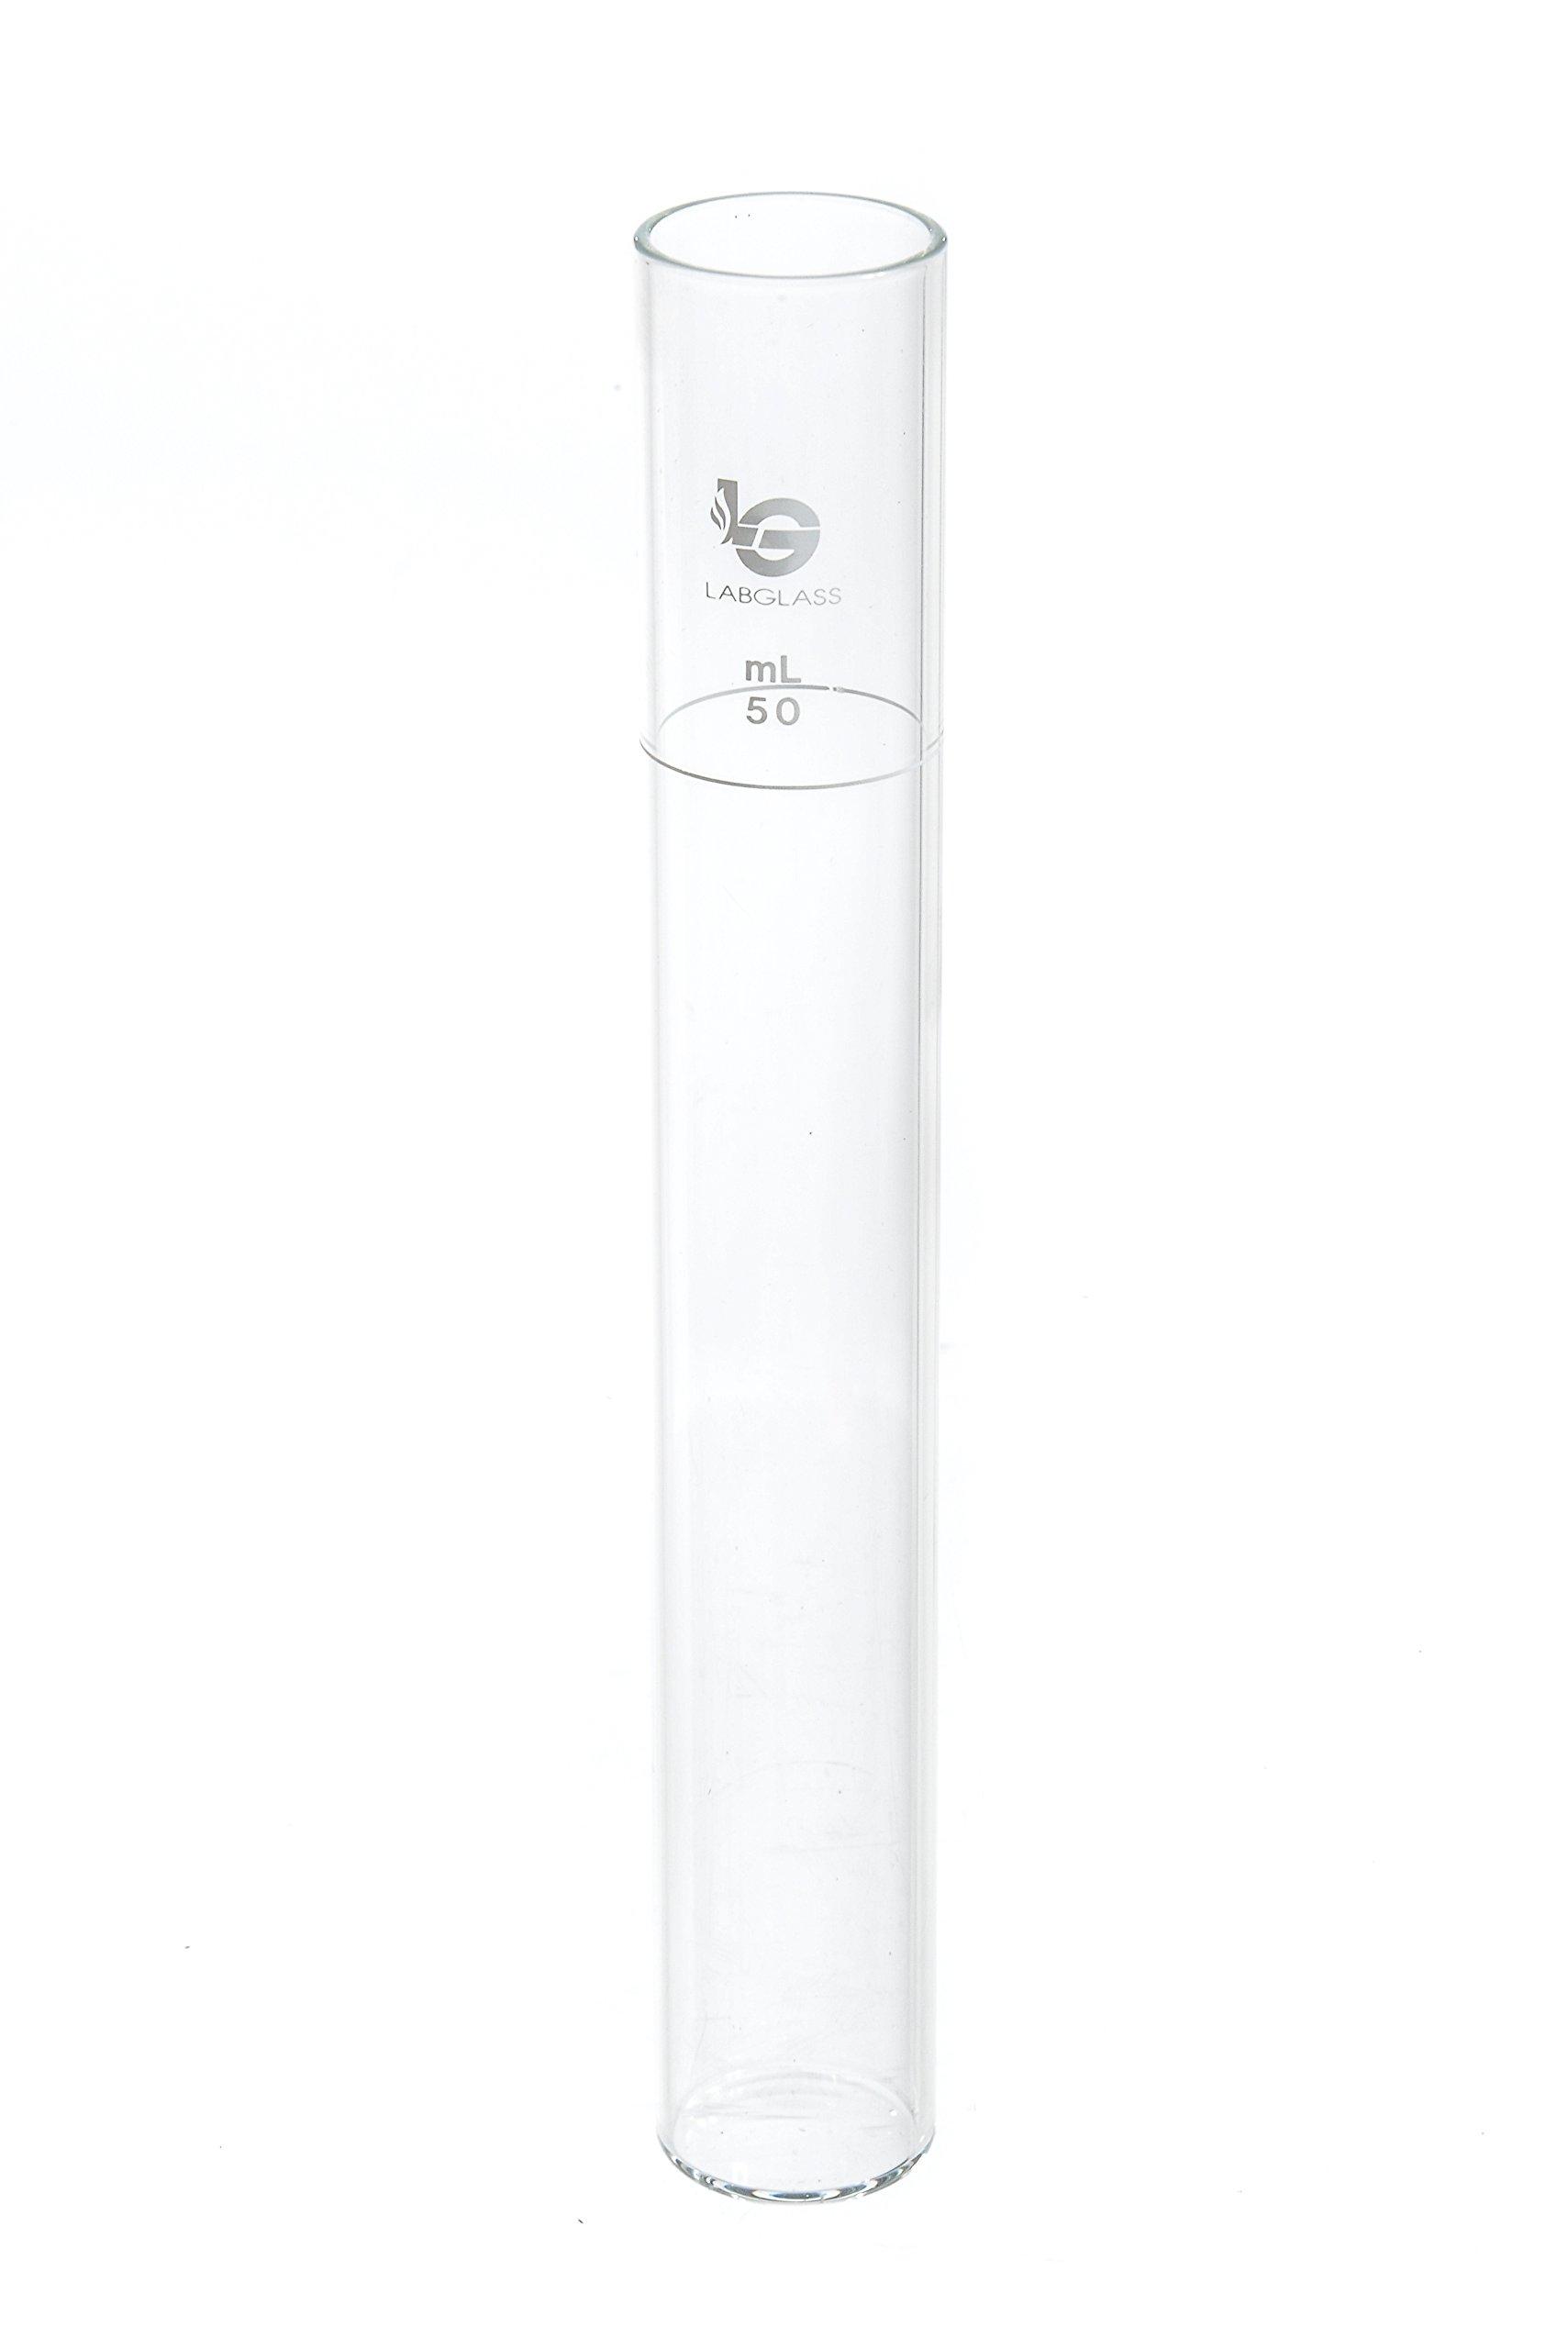 Wilmad-LabGlass LG-10715-100 Nessler Low Form Color Comparison Tube, 50mL